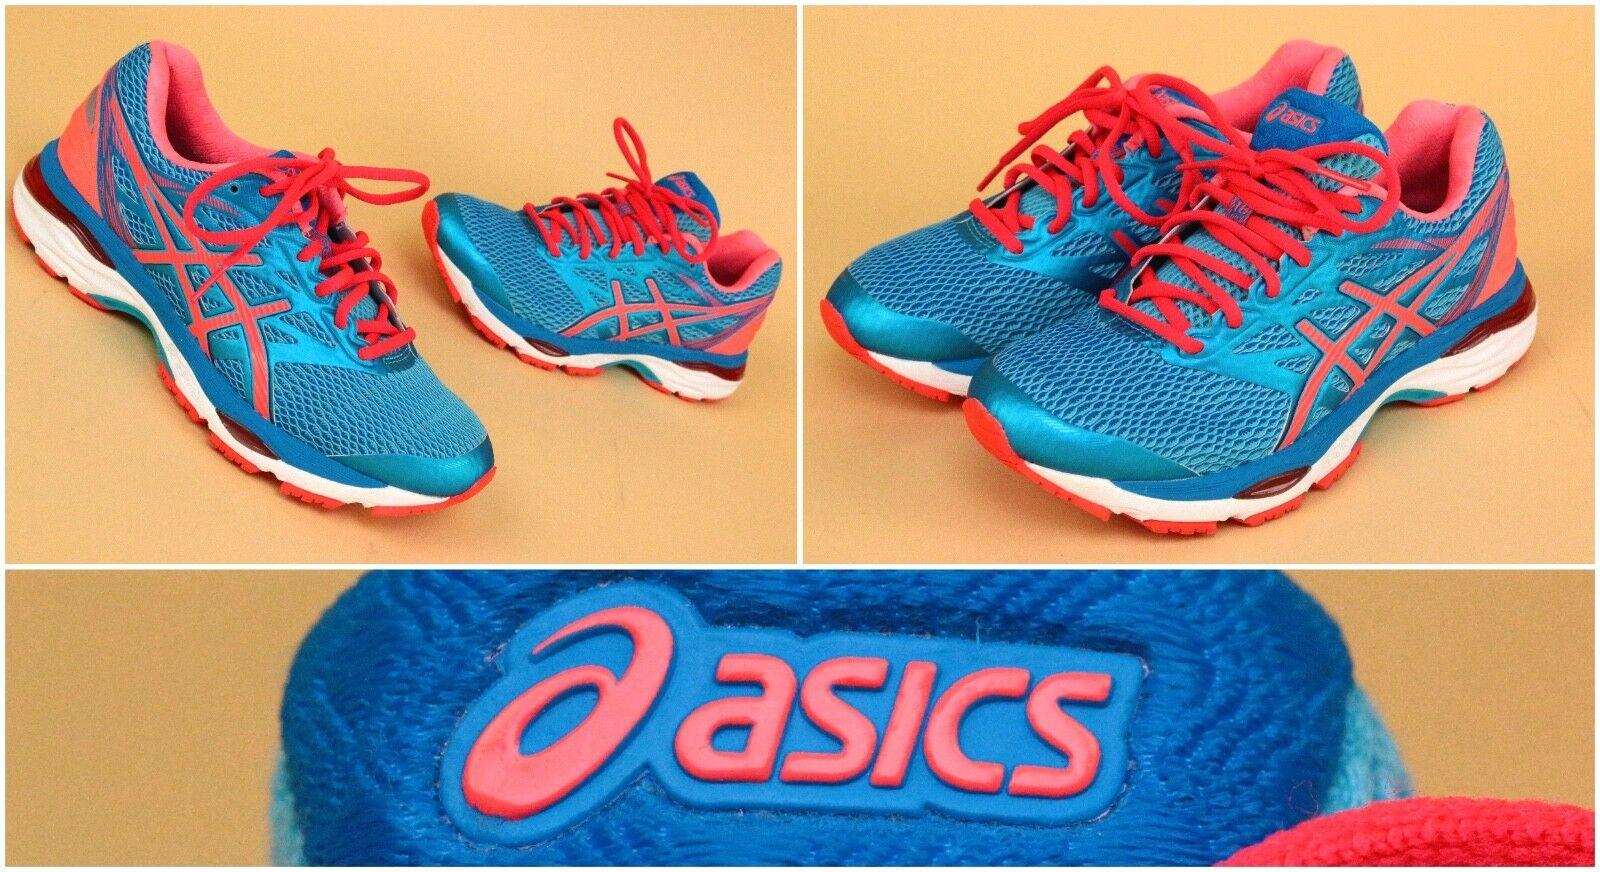 Asics Gel Cumulus 18 Women's Running shoes Size US 6 1 2  - T6C8N - Fast Ship